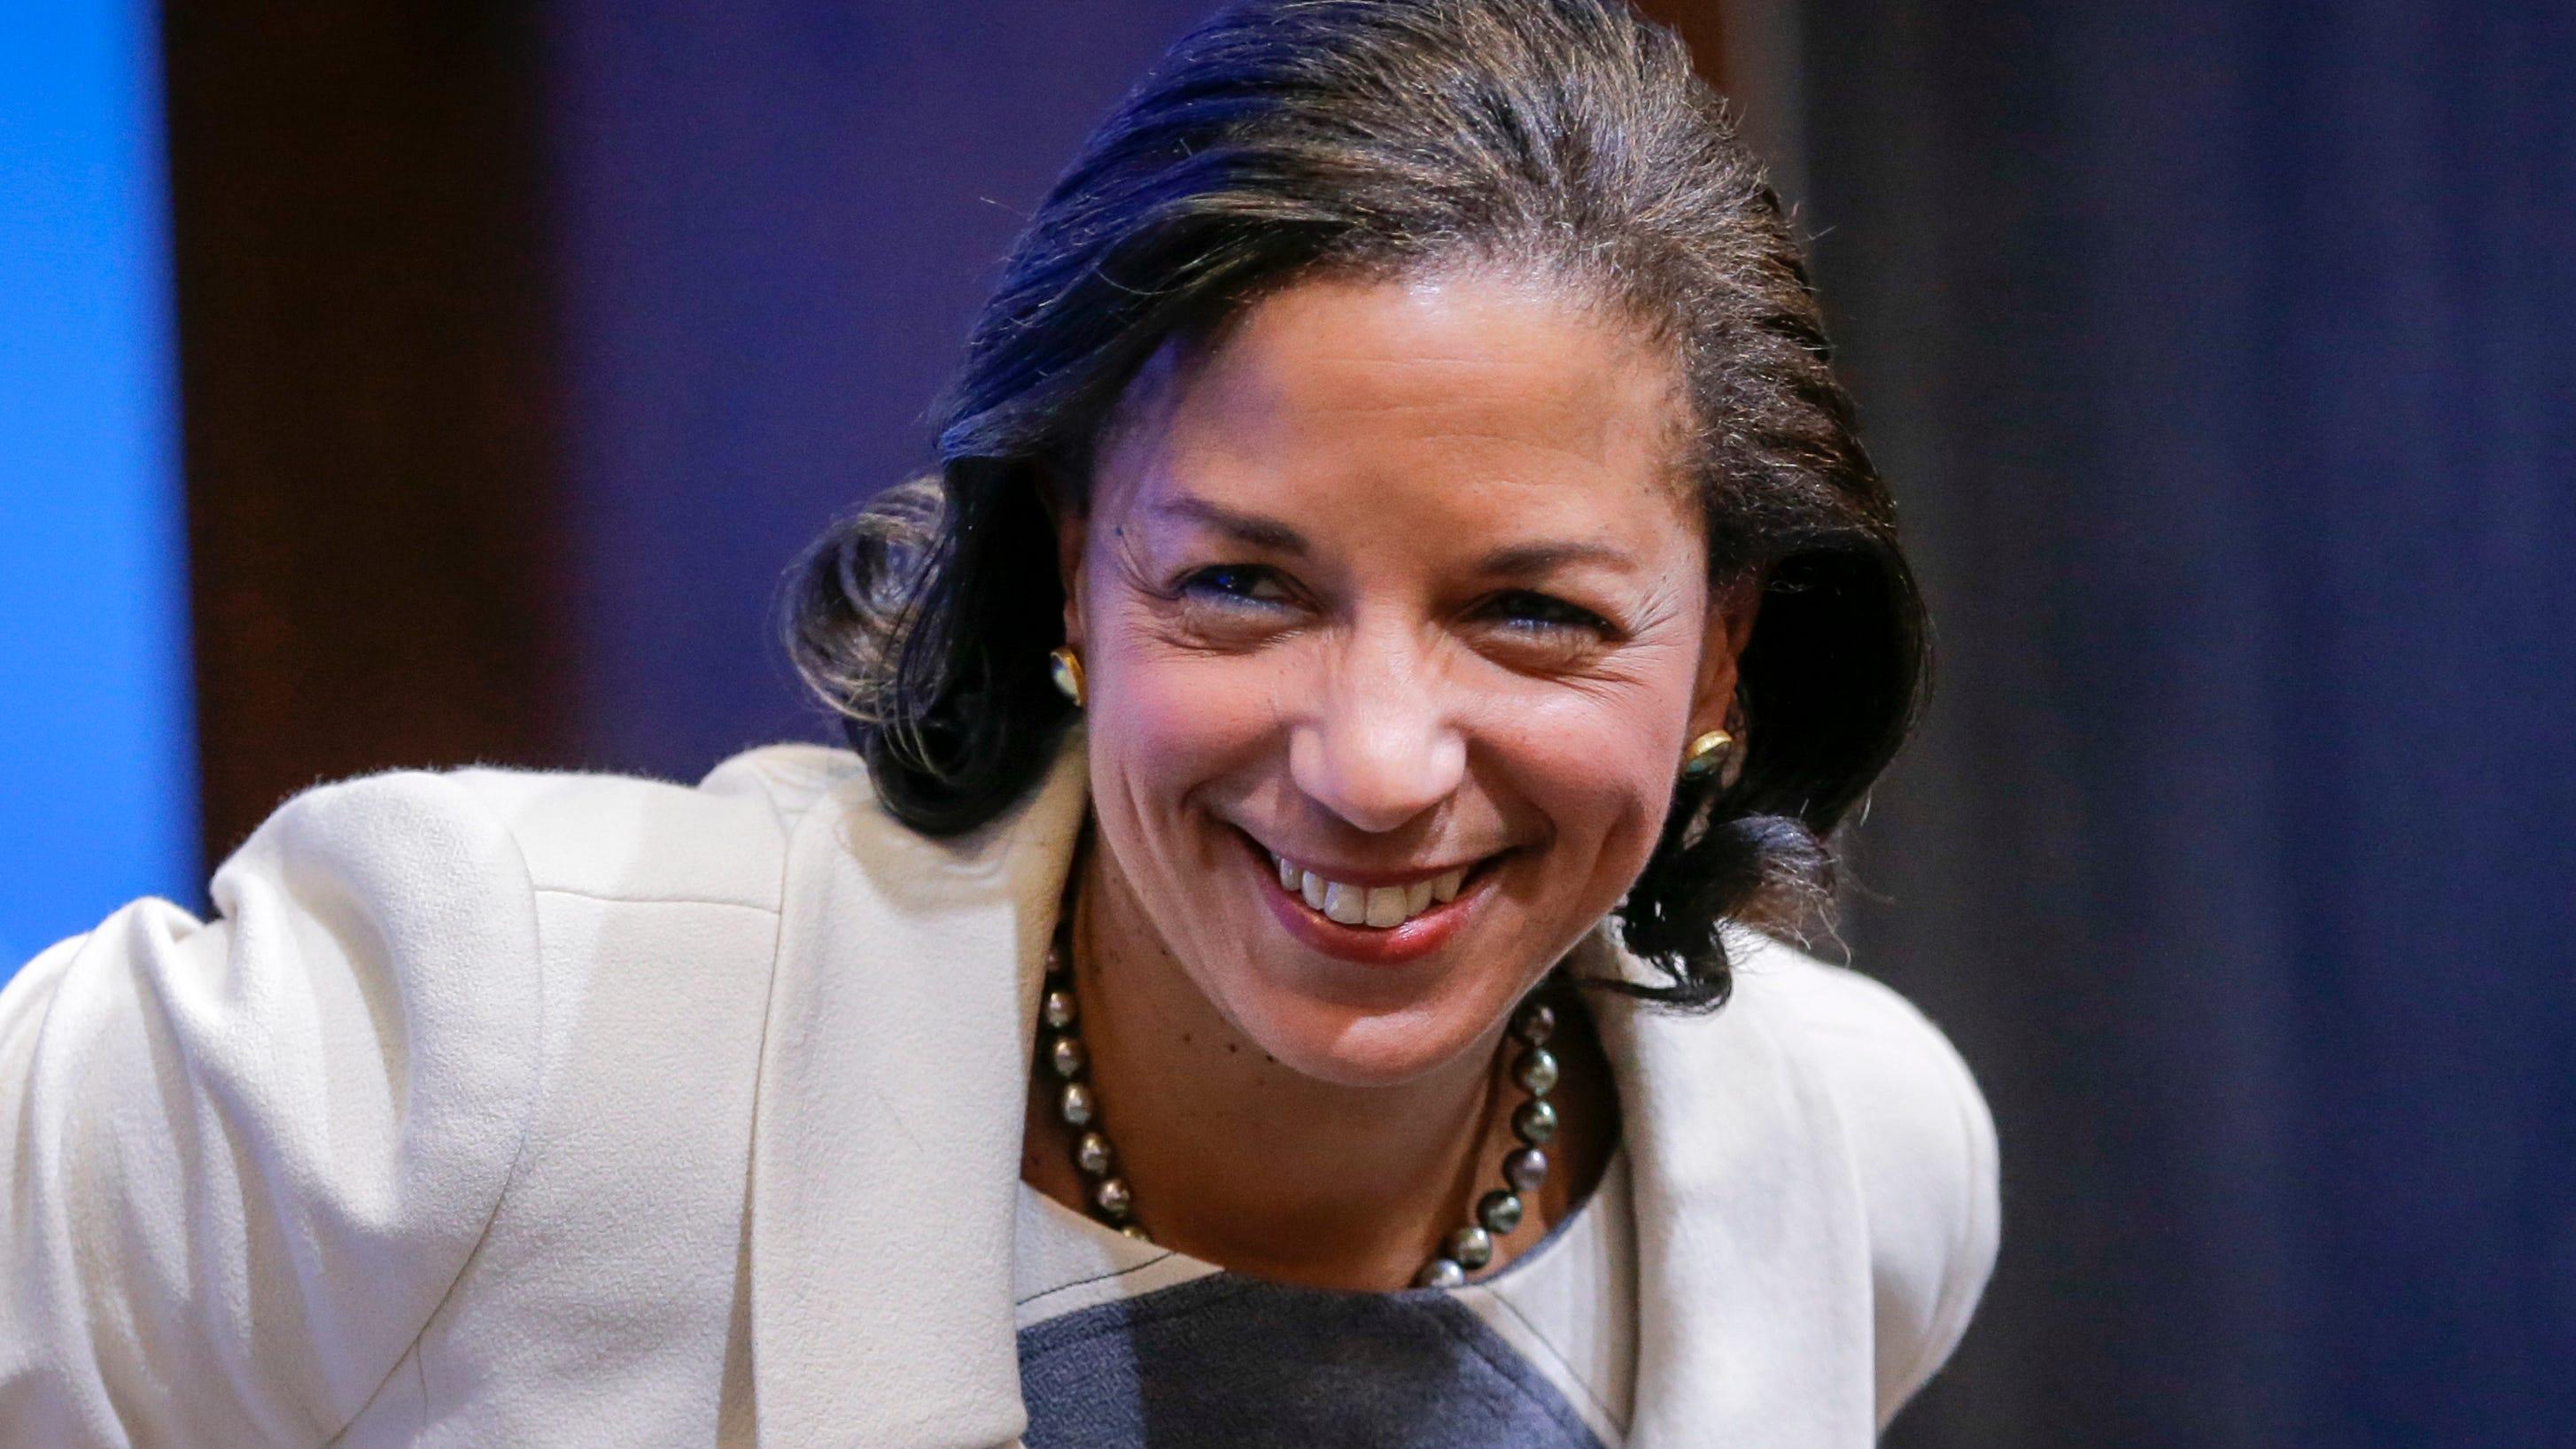 www.usatoday.com: Who should Joe Biden pick as his vice president? Duckworth? Demings? Harris? Rice?